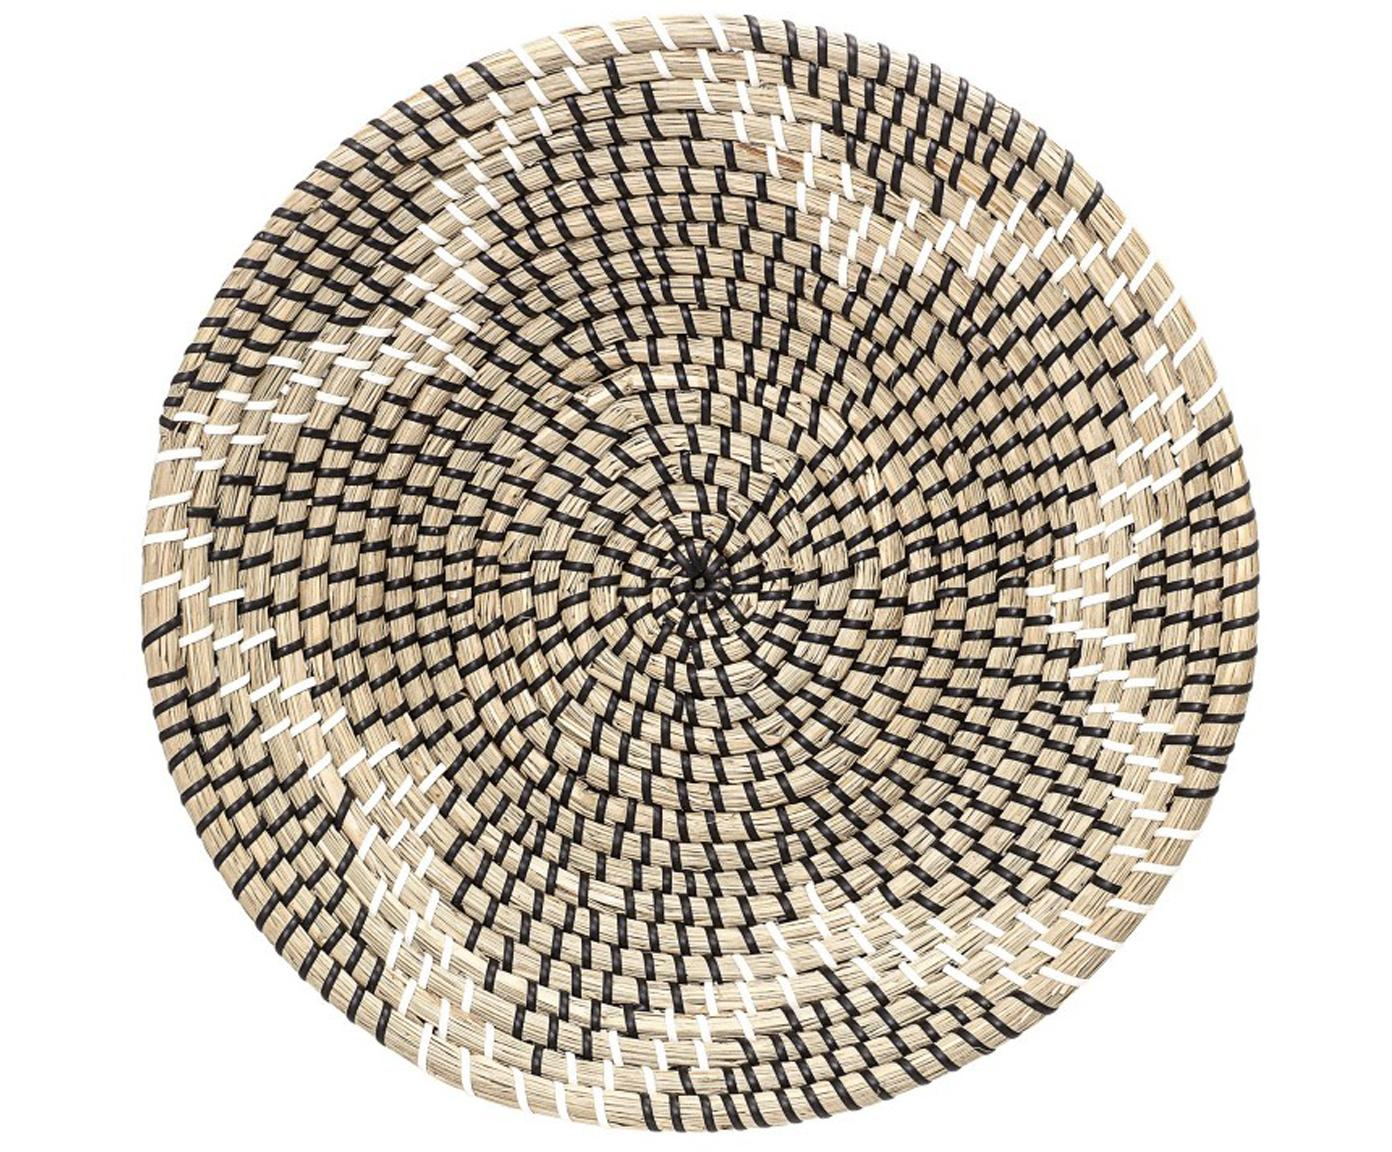 Wandobject Star van zeegras, Zeegras, Beige, zwart, Ø 36 x D 7 cm